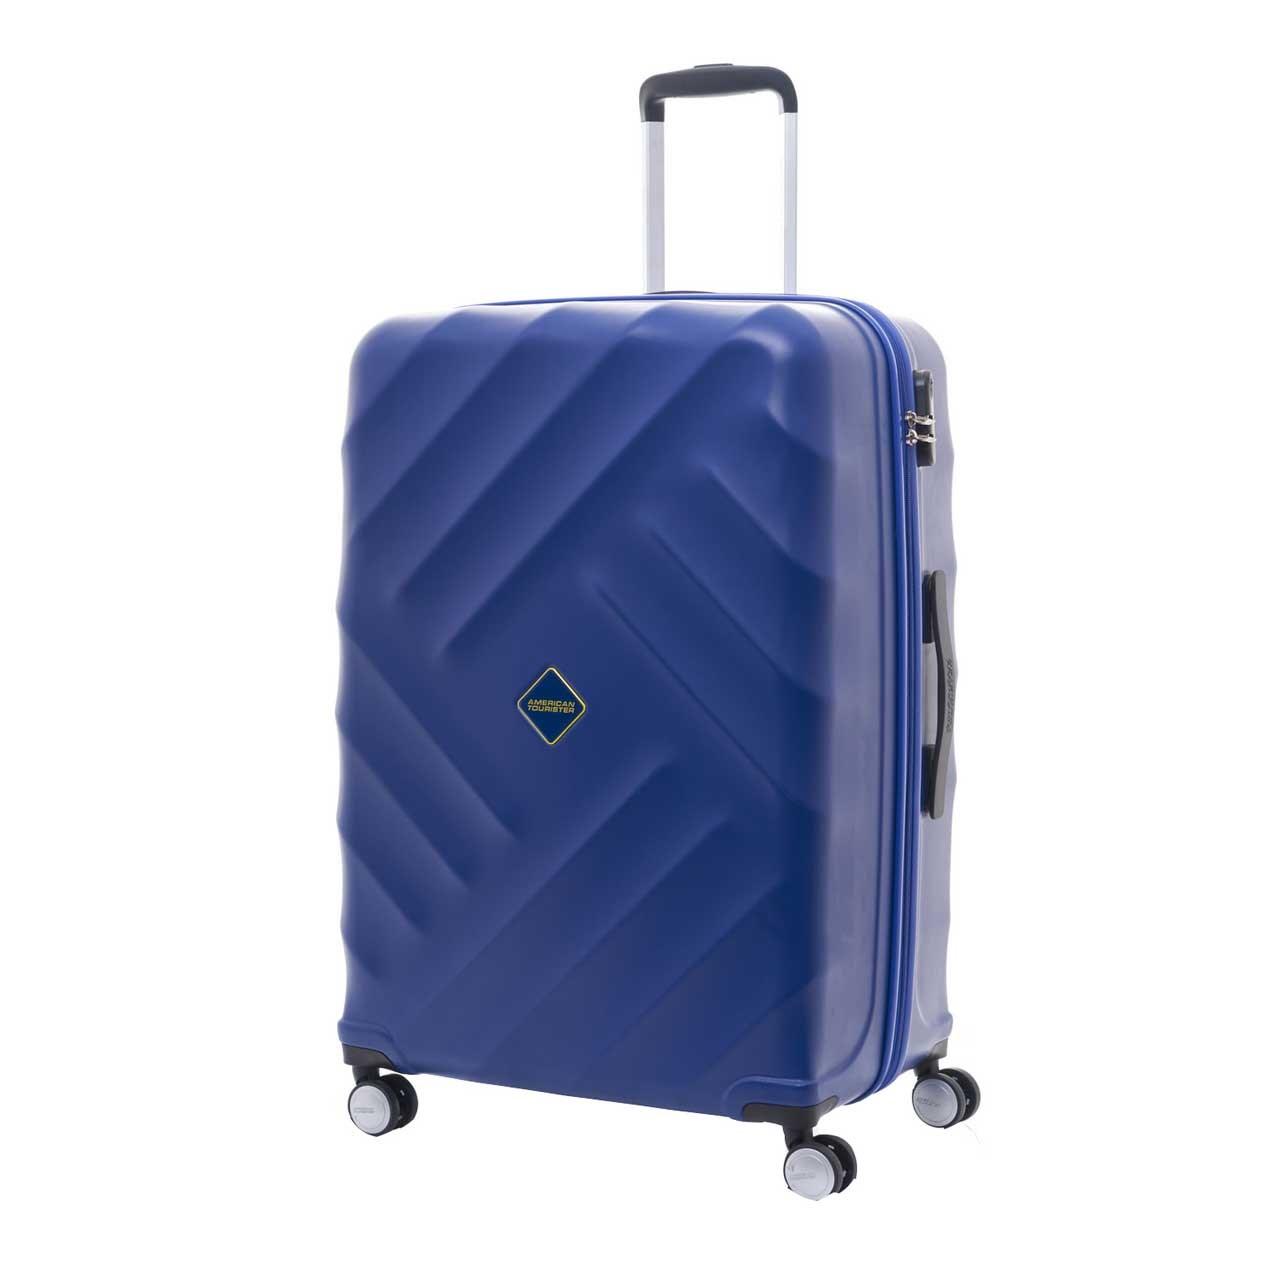 چمدان امریکن توریستر مدل Gravity کد AN8 001